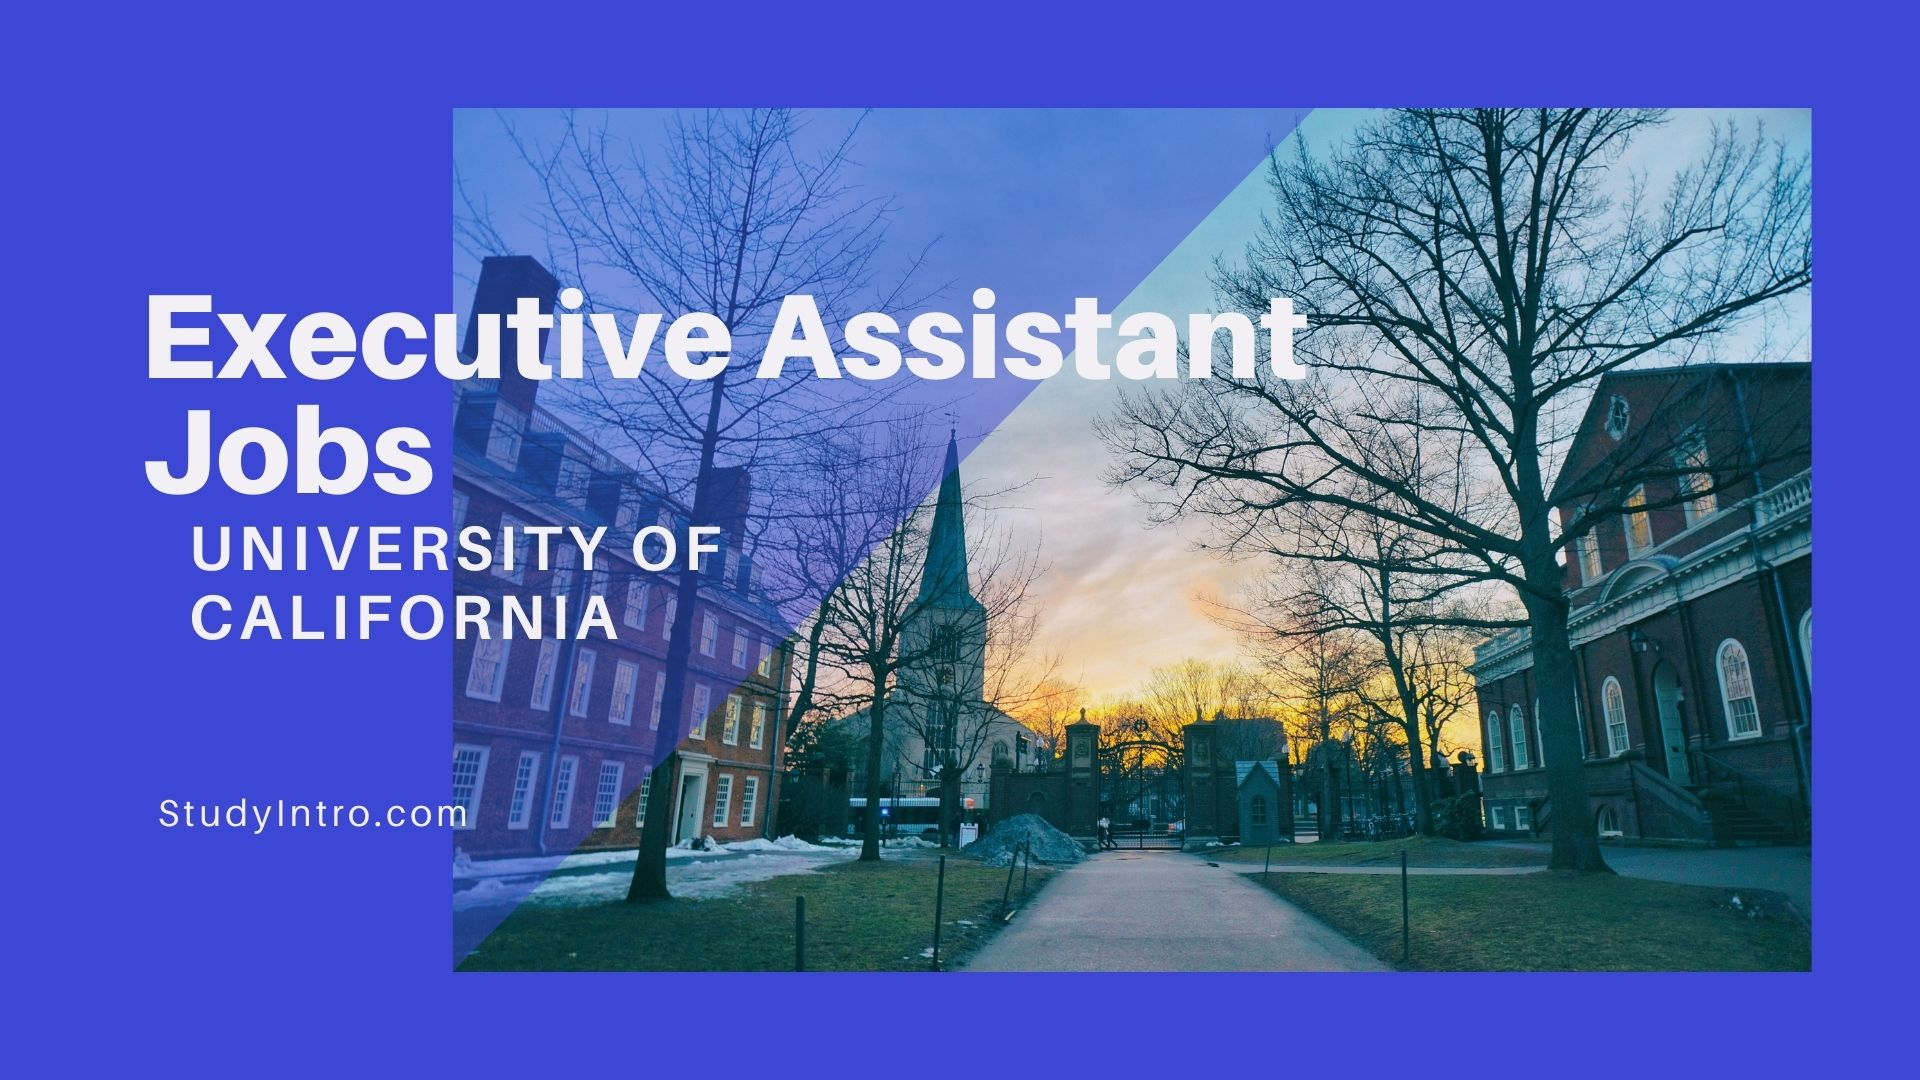 Executive Assistant Job in University of California, Berkeley